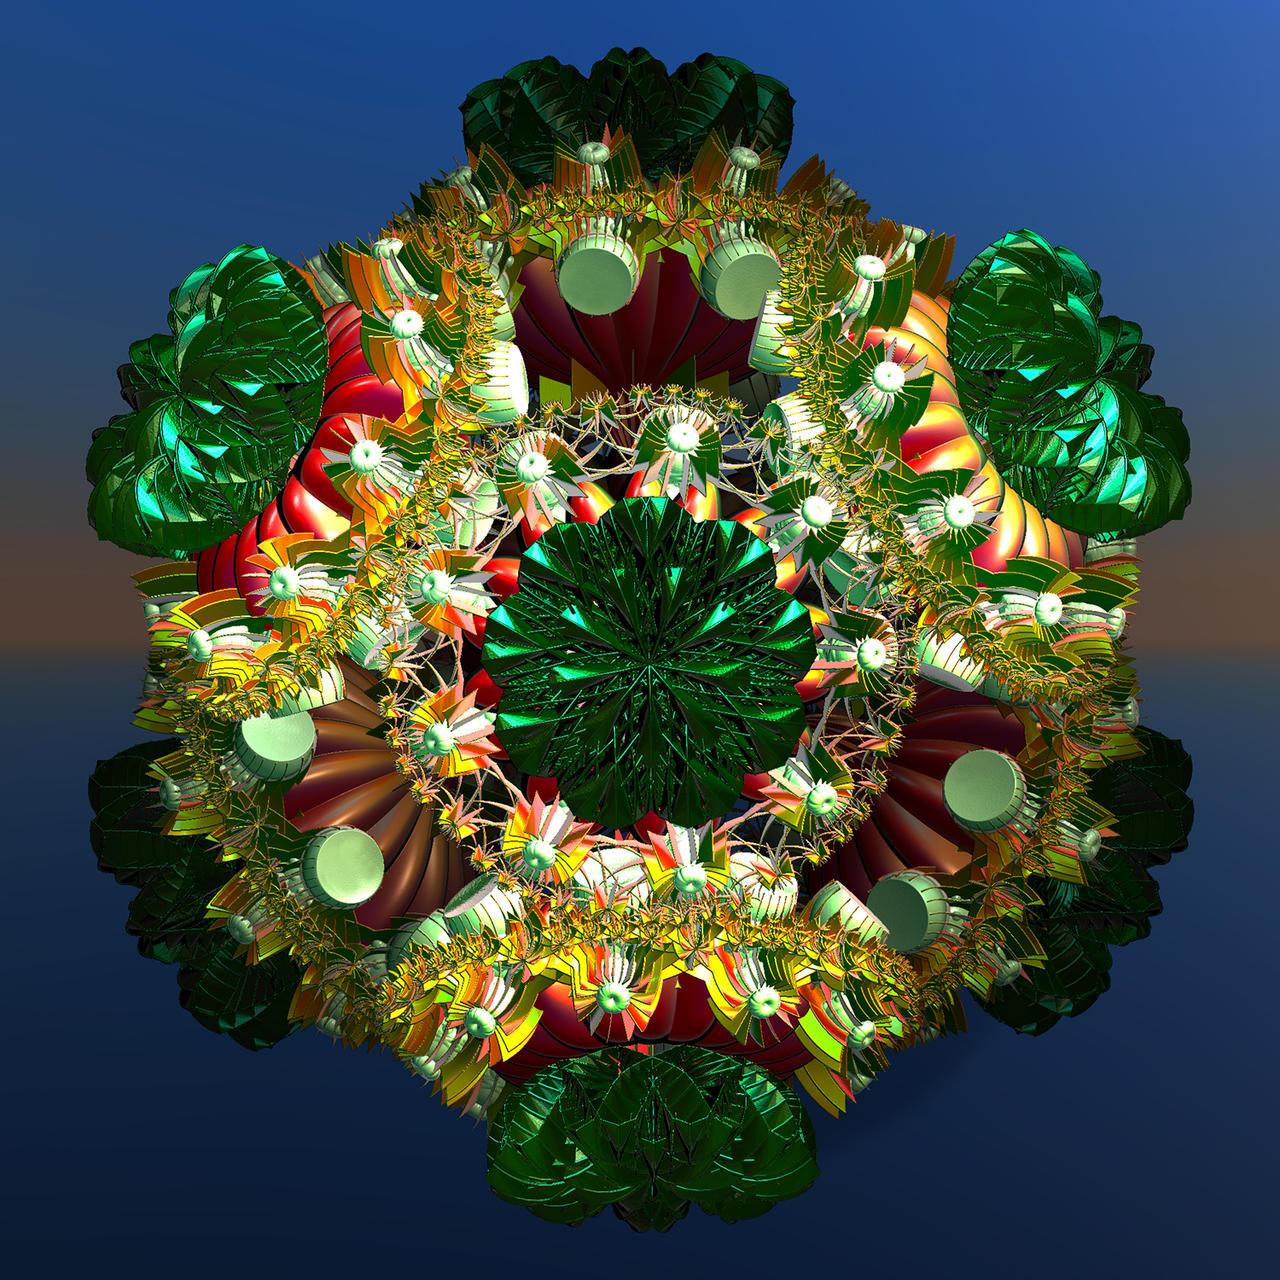 Green Spicky by littleriverqueen